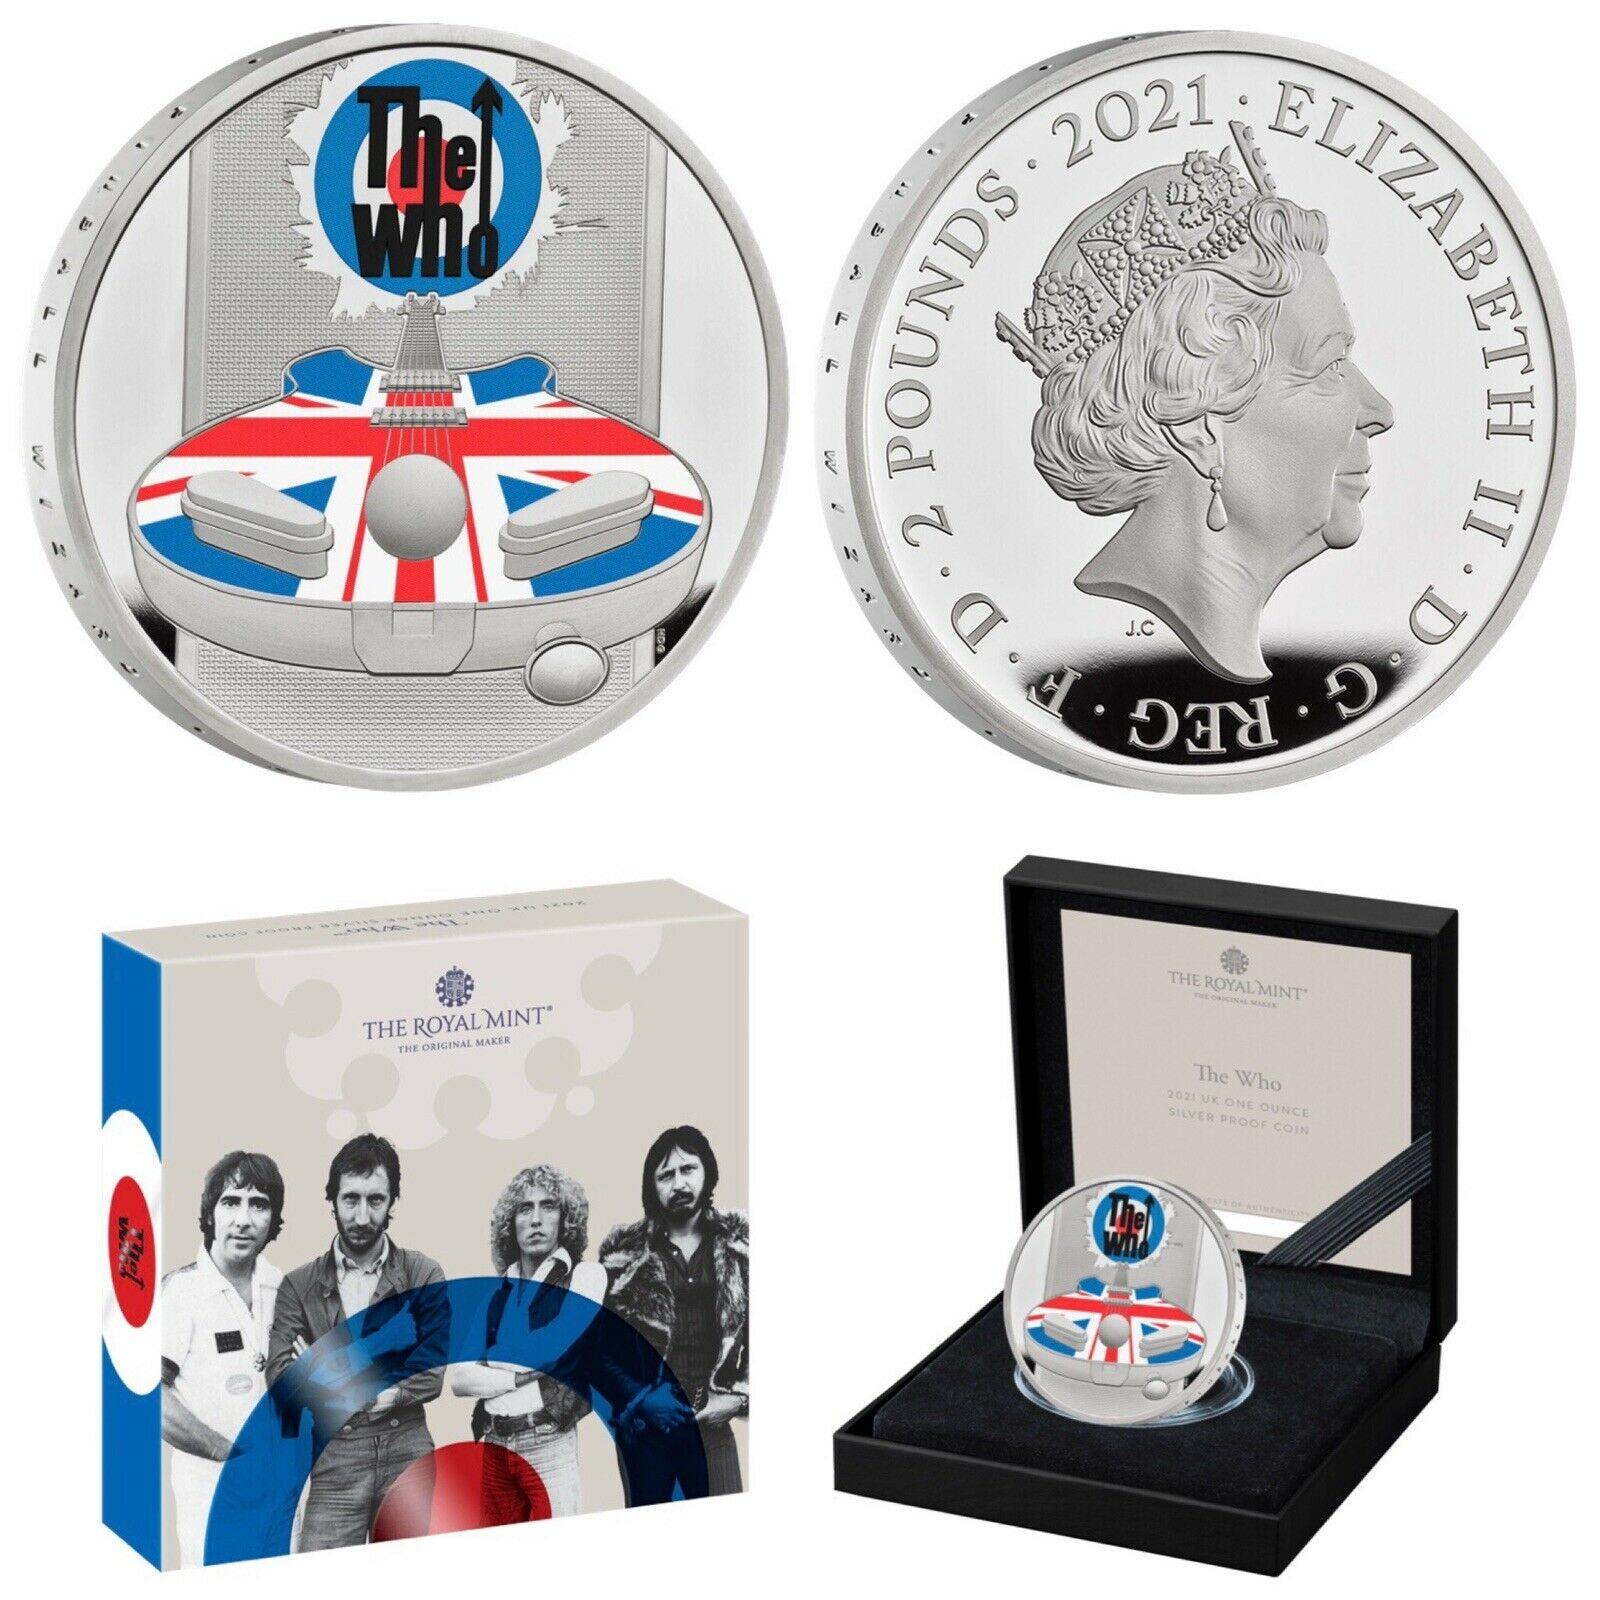 The Who Music Legends 1 Oz Ag proof coin  - zvìtšit obrázek